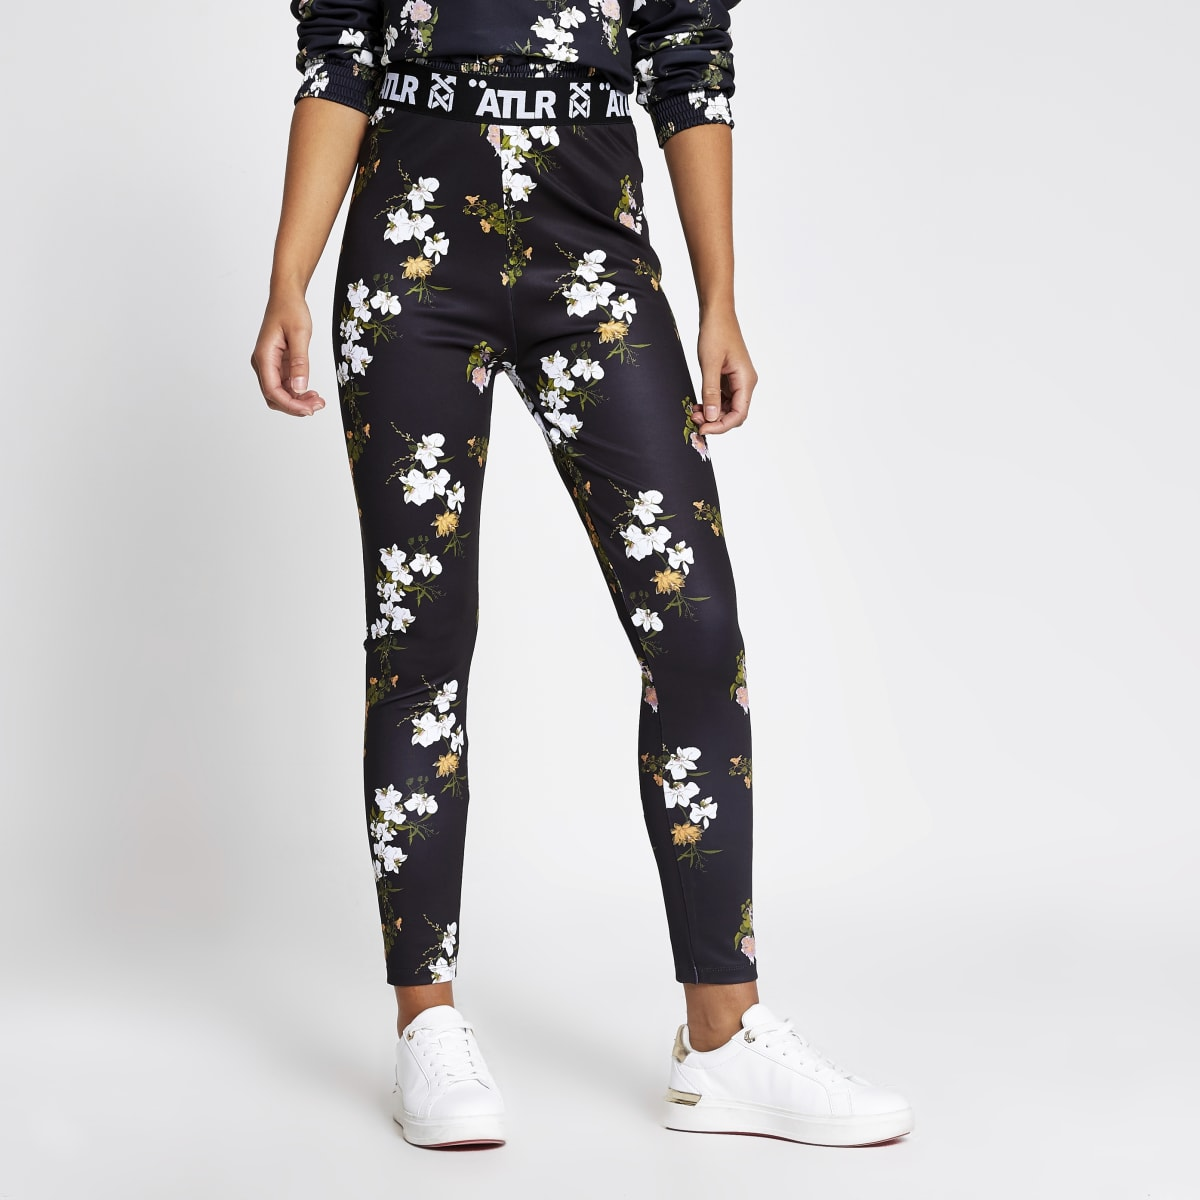 Black ATLR floral elasticated leggings